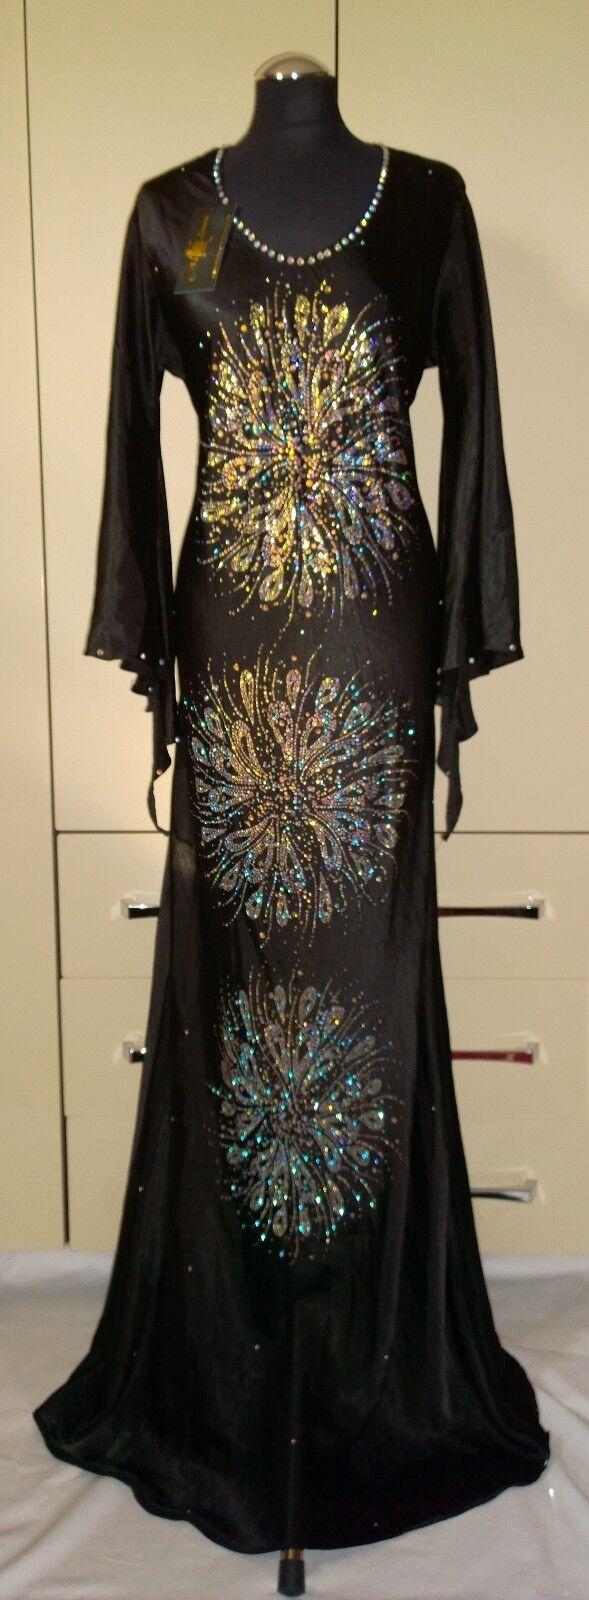 AbsoluHommest magnifique Africain traditionnel robe longue-Taille unique ( B16)